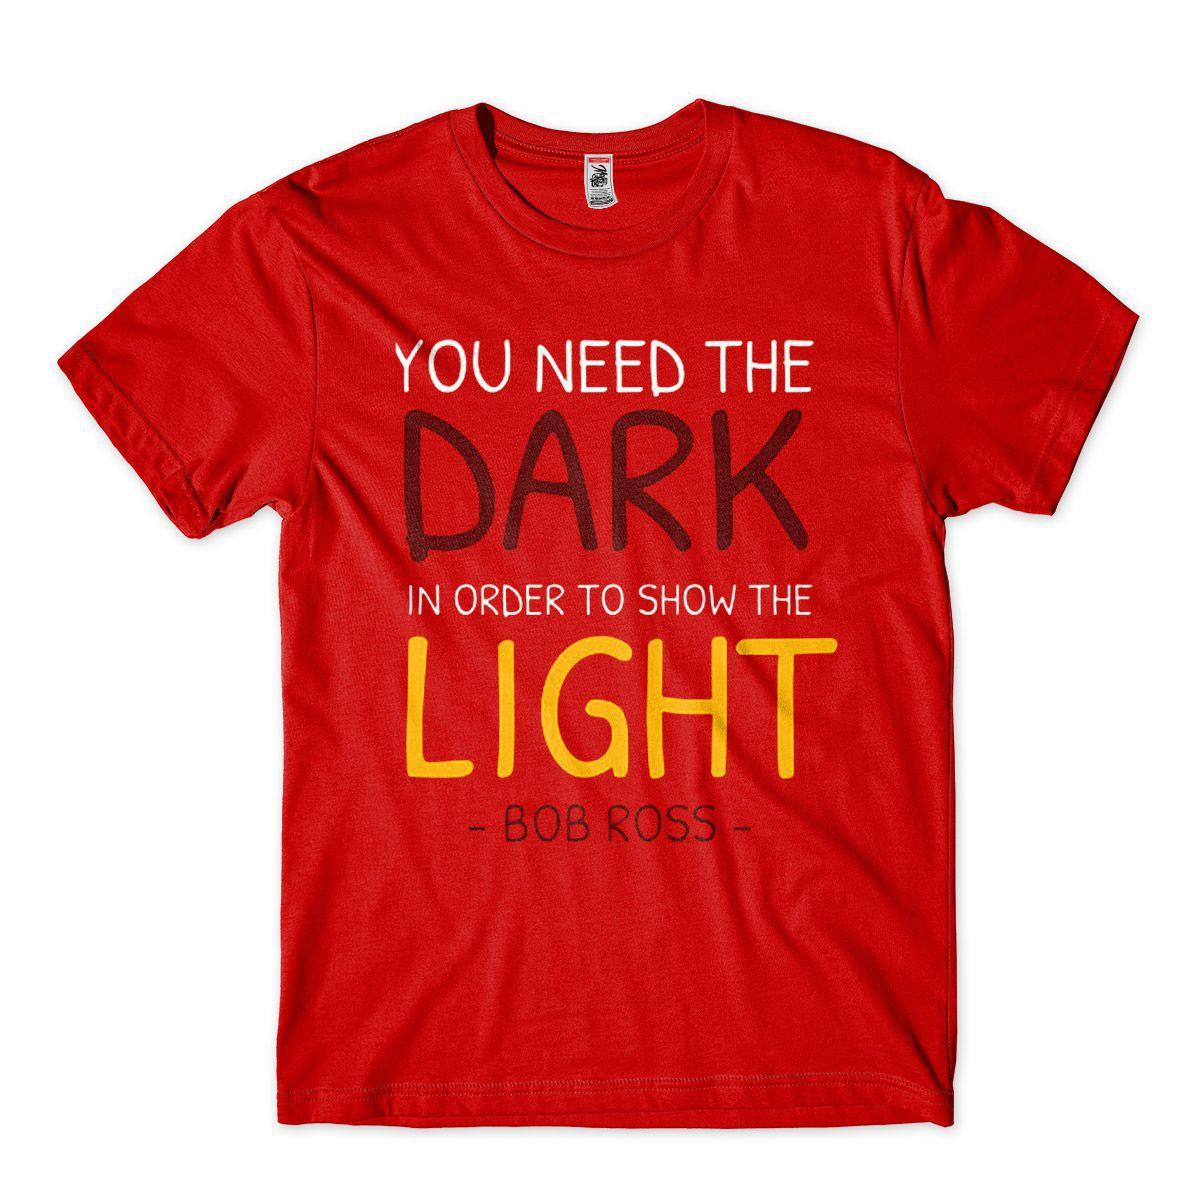 Camiseta Artista Bob Ross A Luz precisa da Escuridao